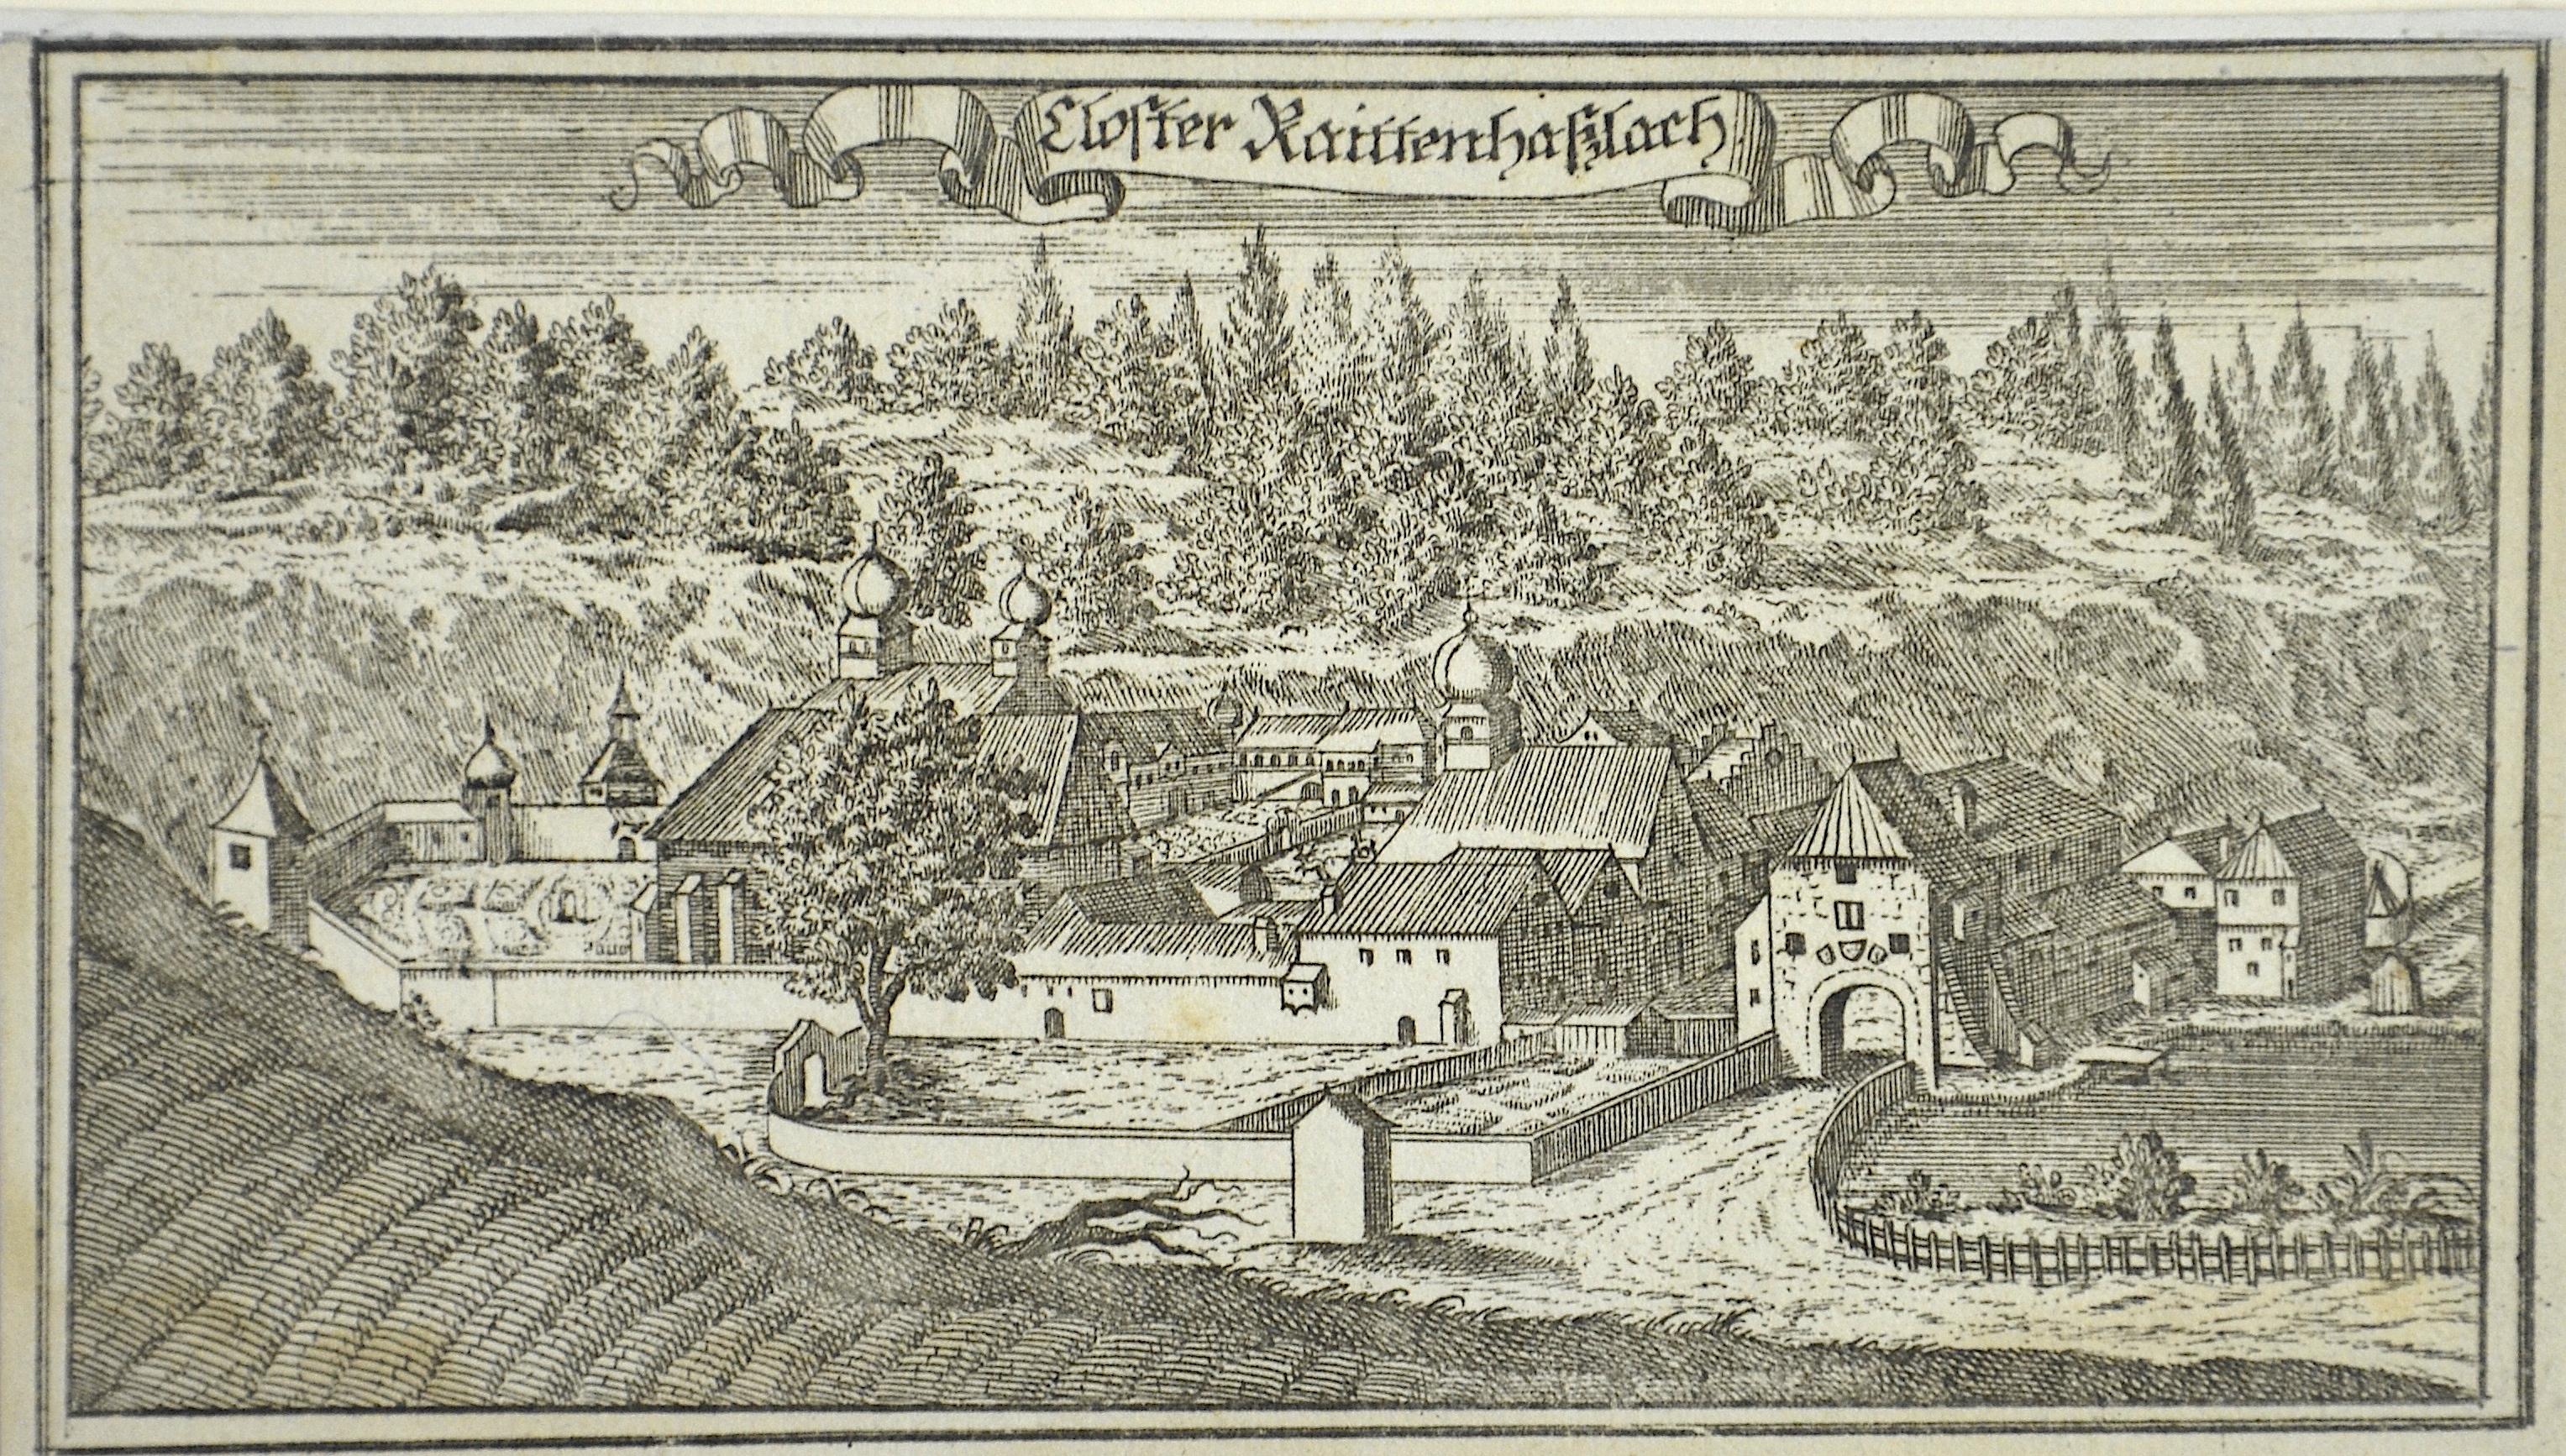 Ertl Anton Wilhelm Closter Raittenhaßlach.